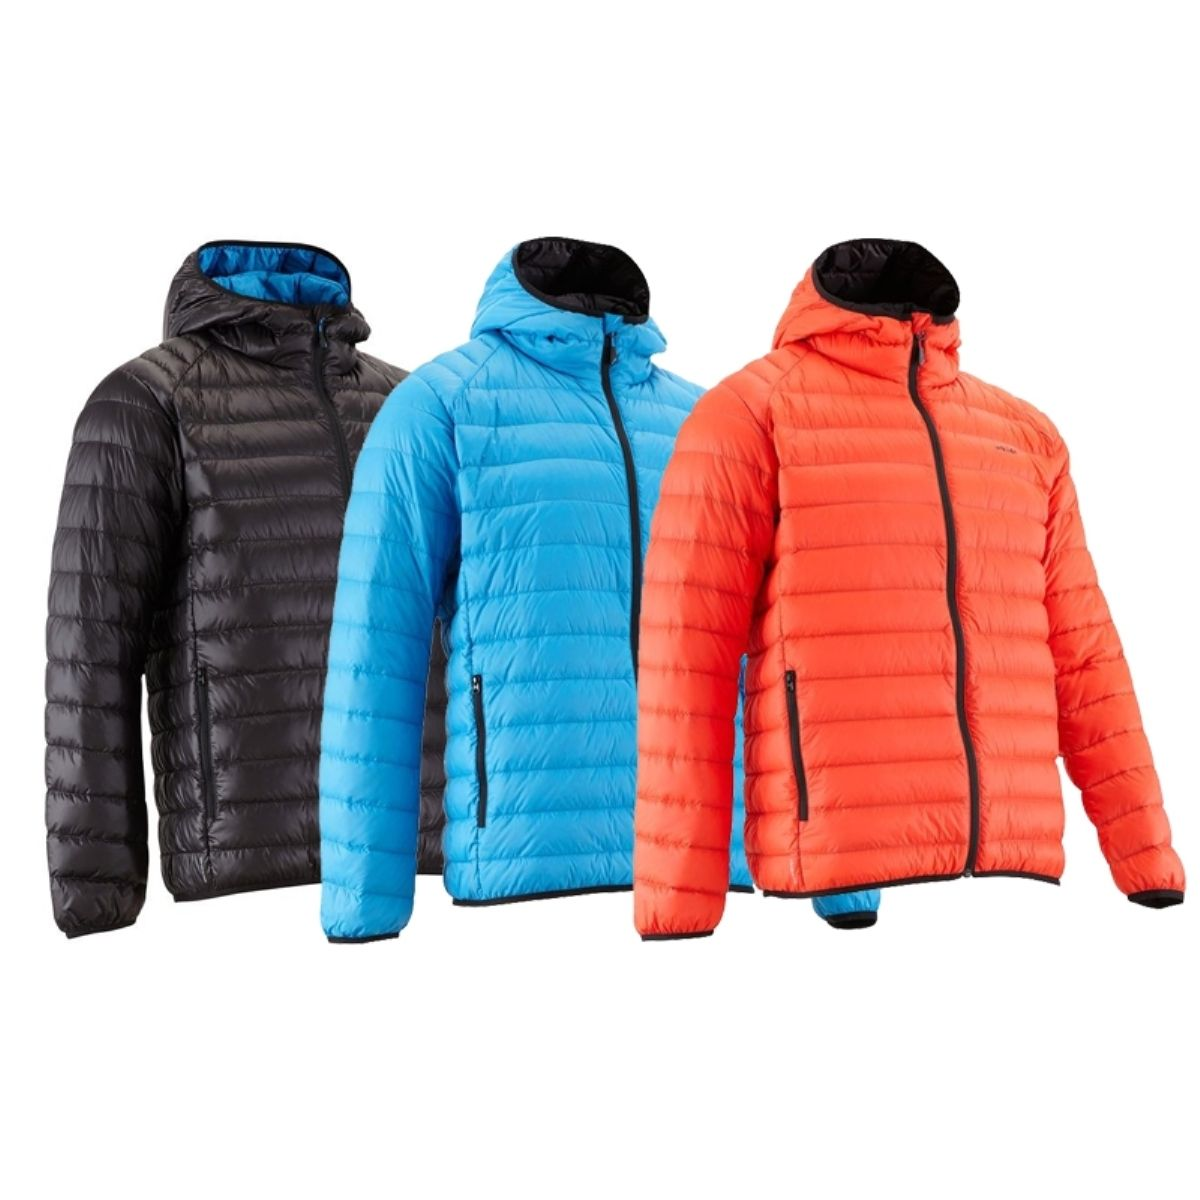 Upto -5 degree. Apparel, Quechua WARM-DOWN-SKI-JACKET